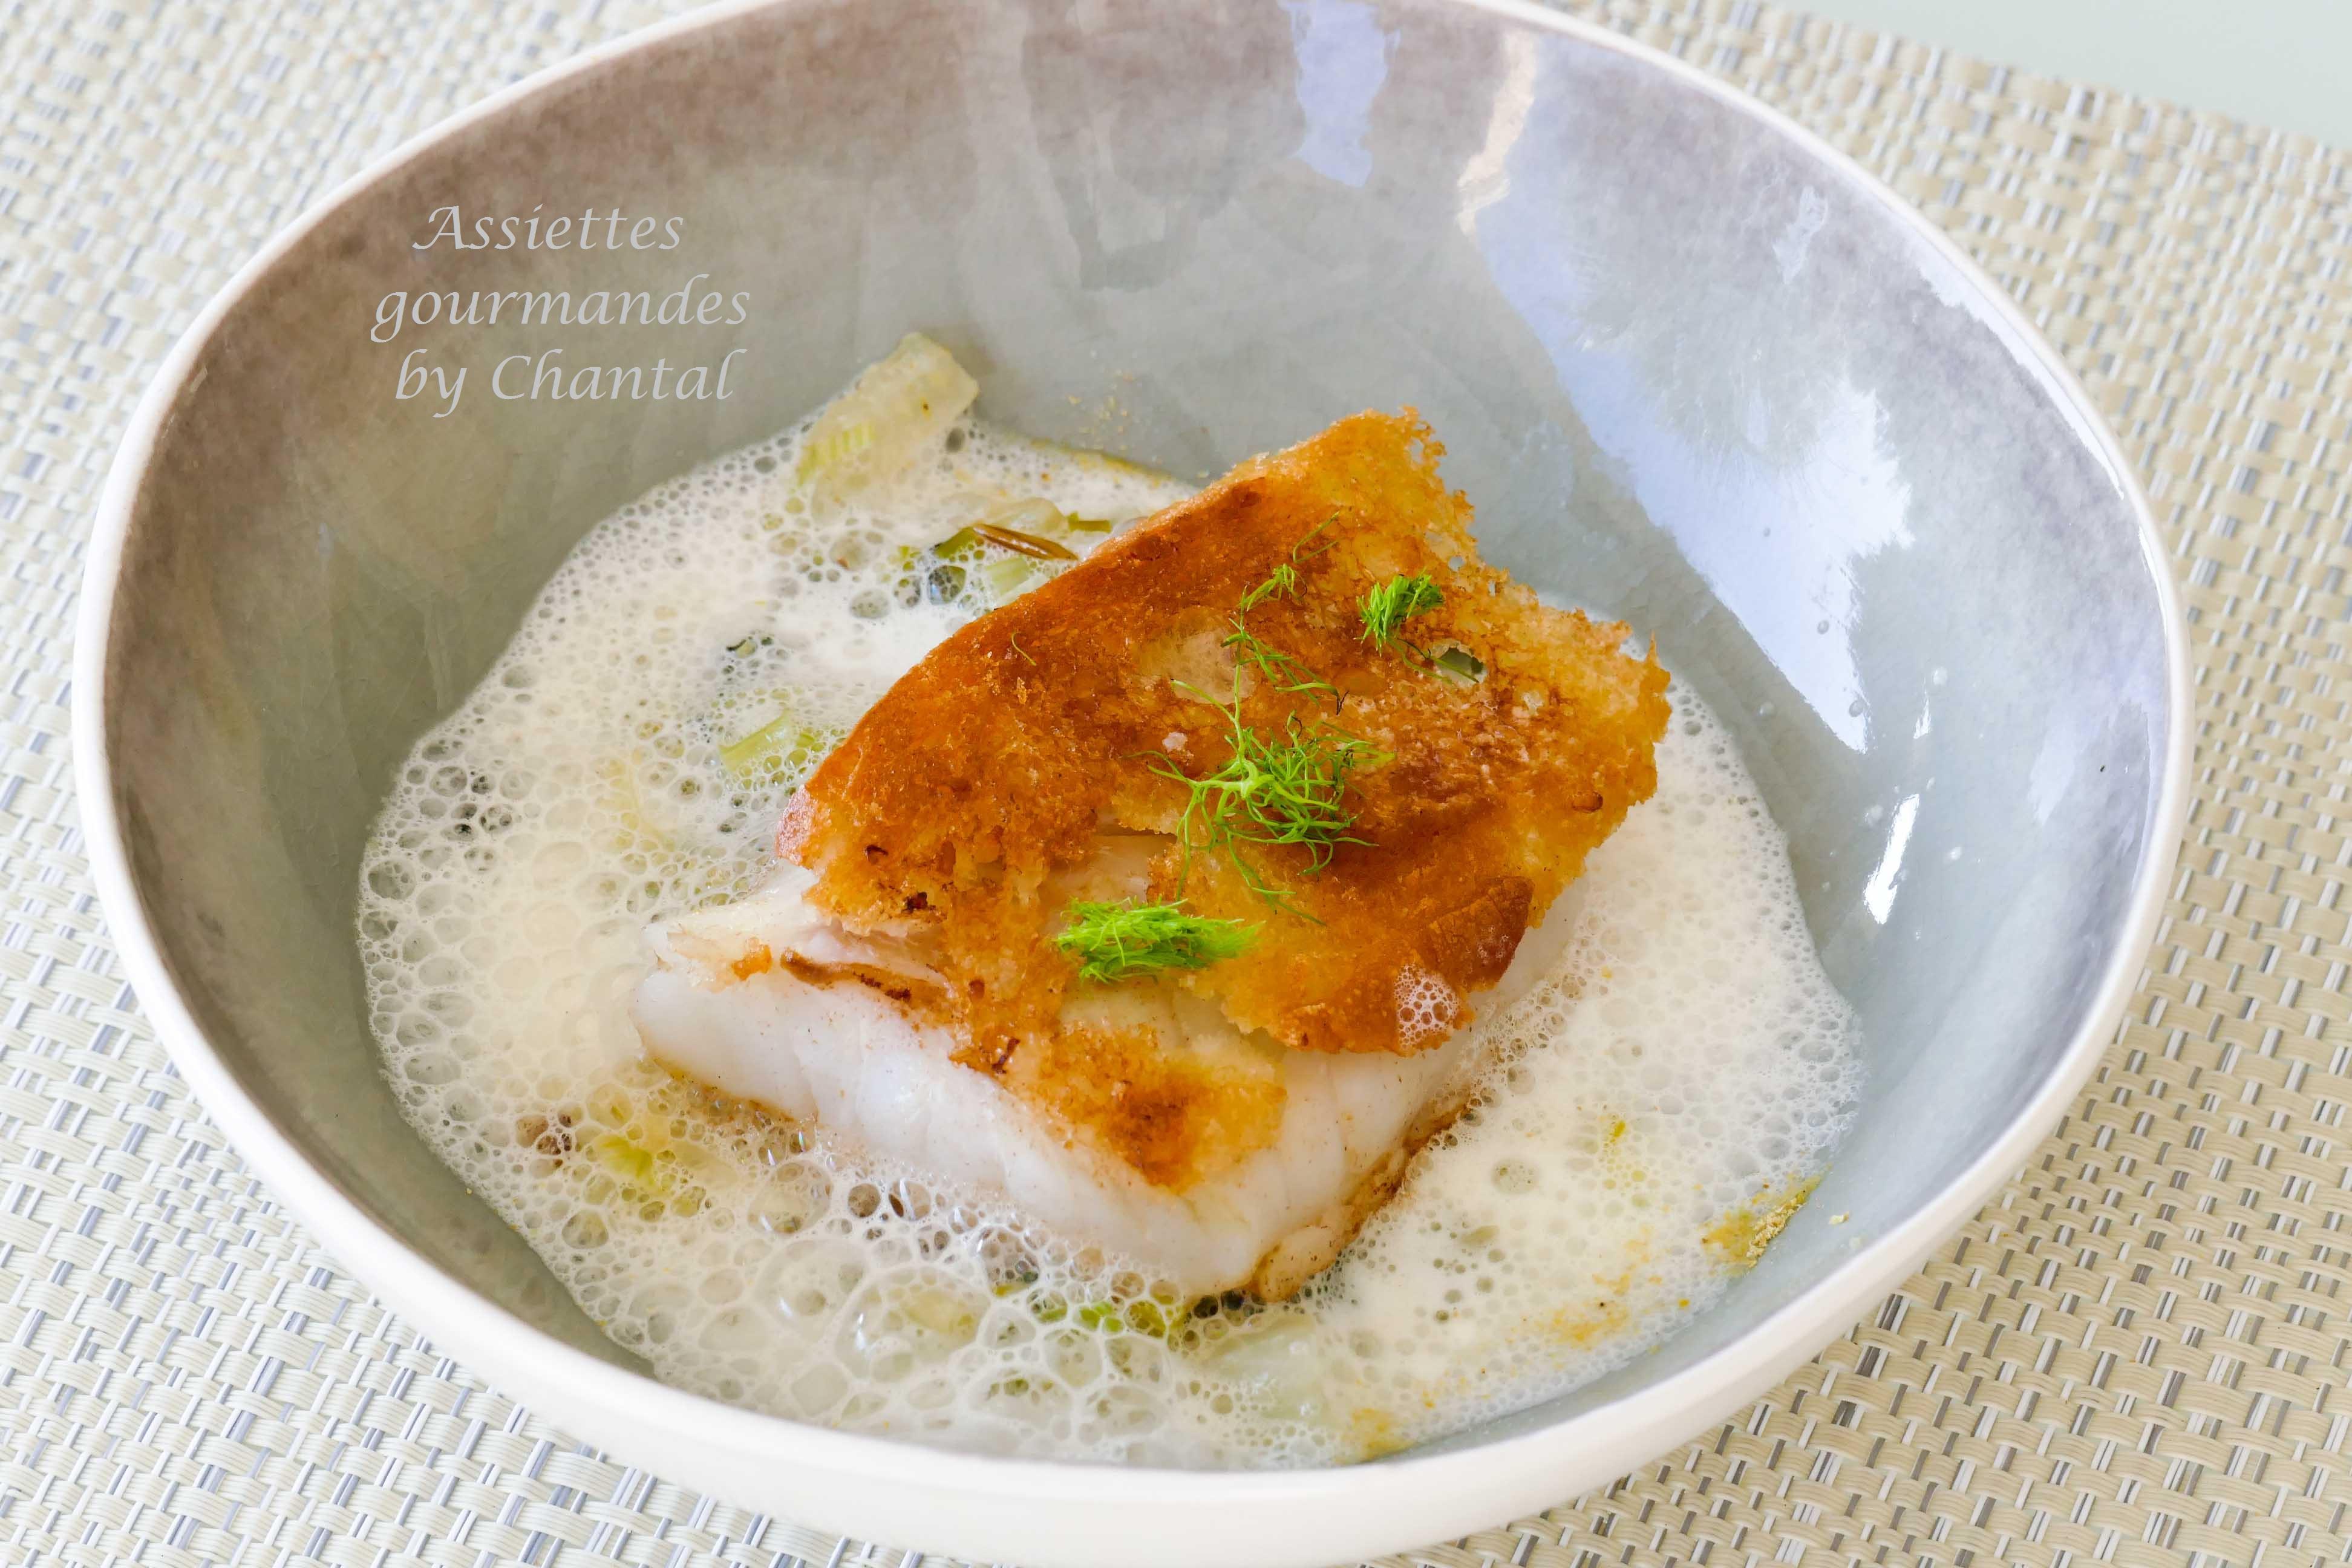 Cabillaud r ti au pain fenouil et bouillon menthe agrumes for Cabillaud fenouil